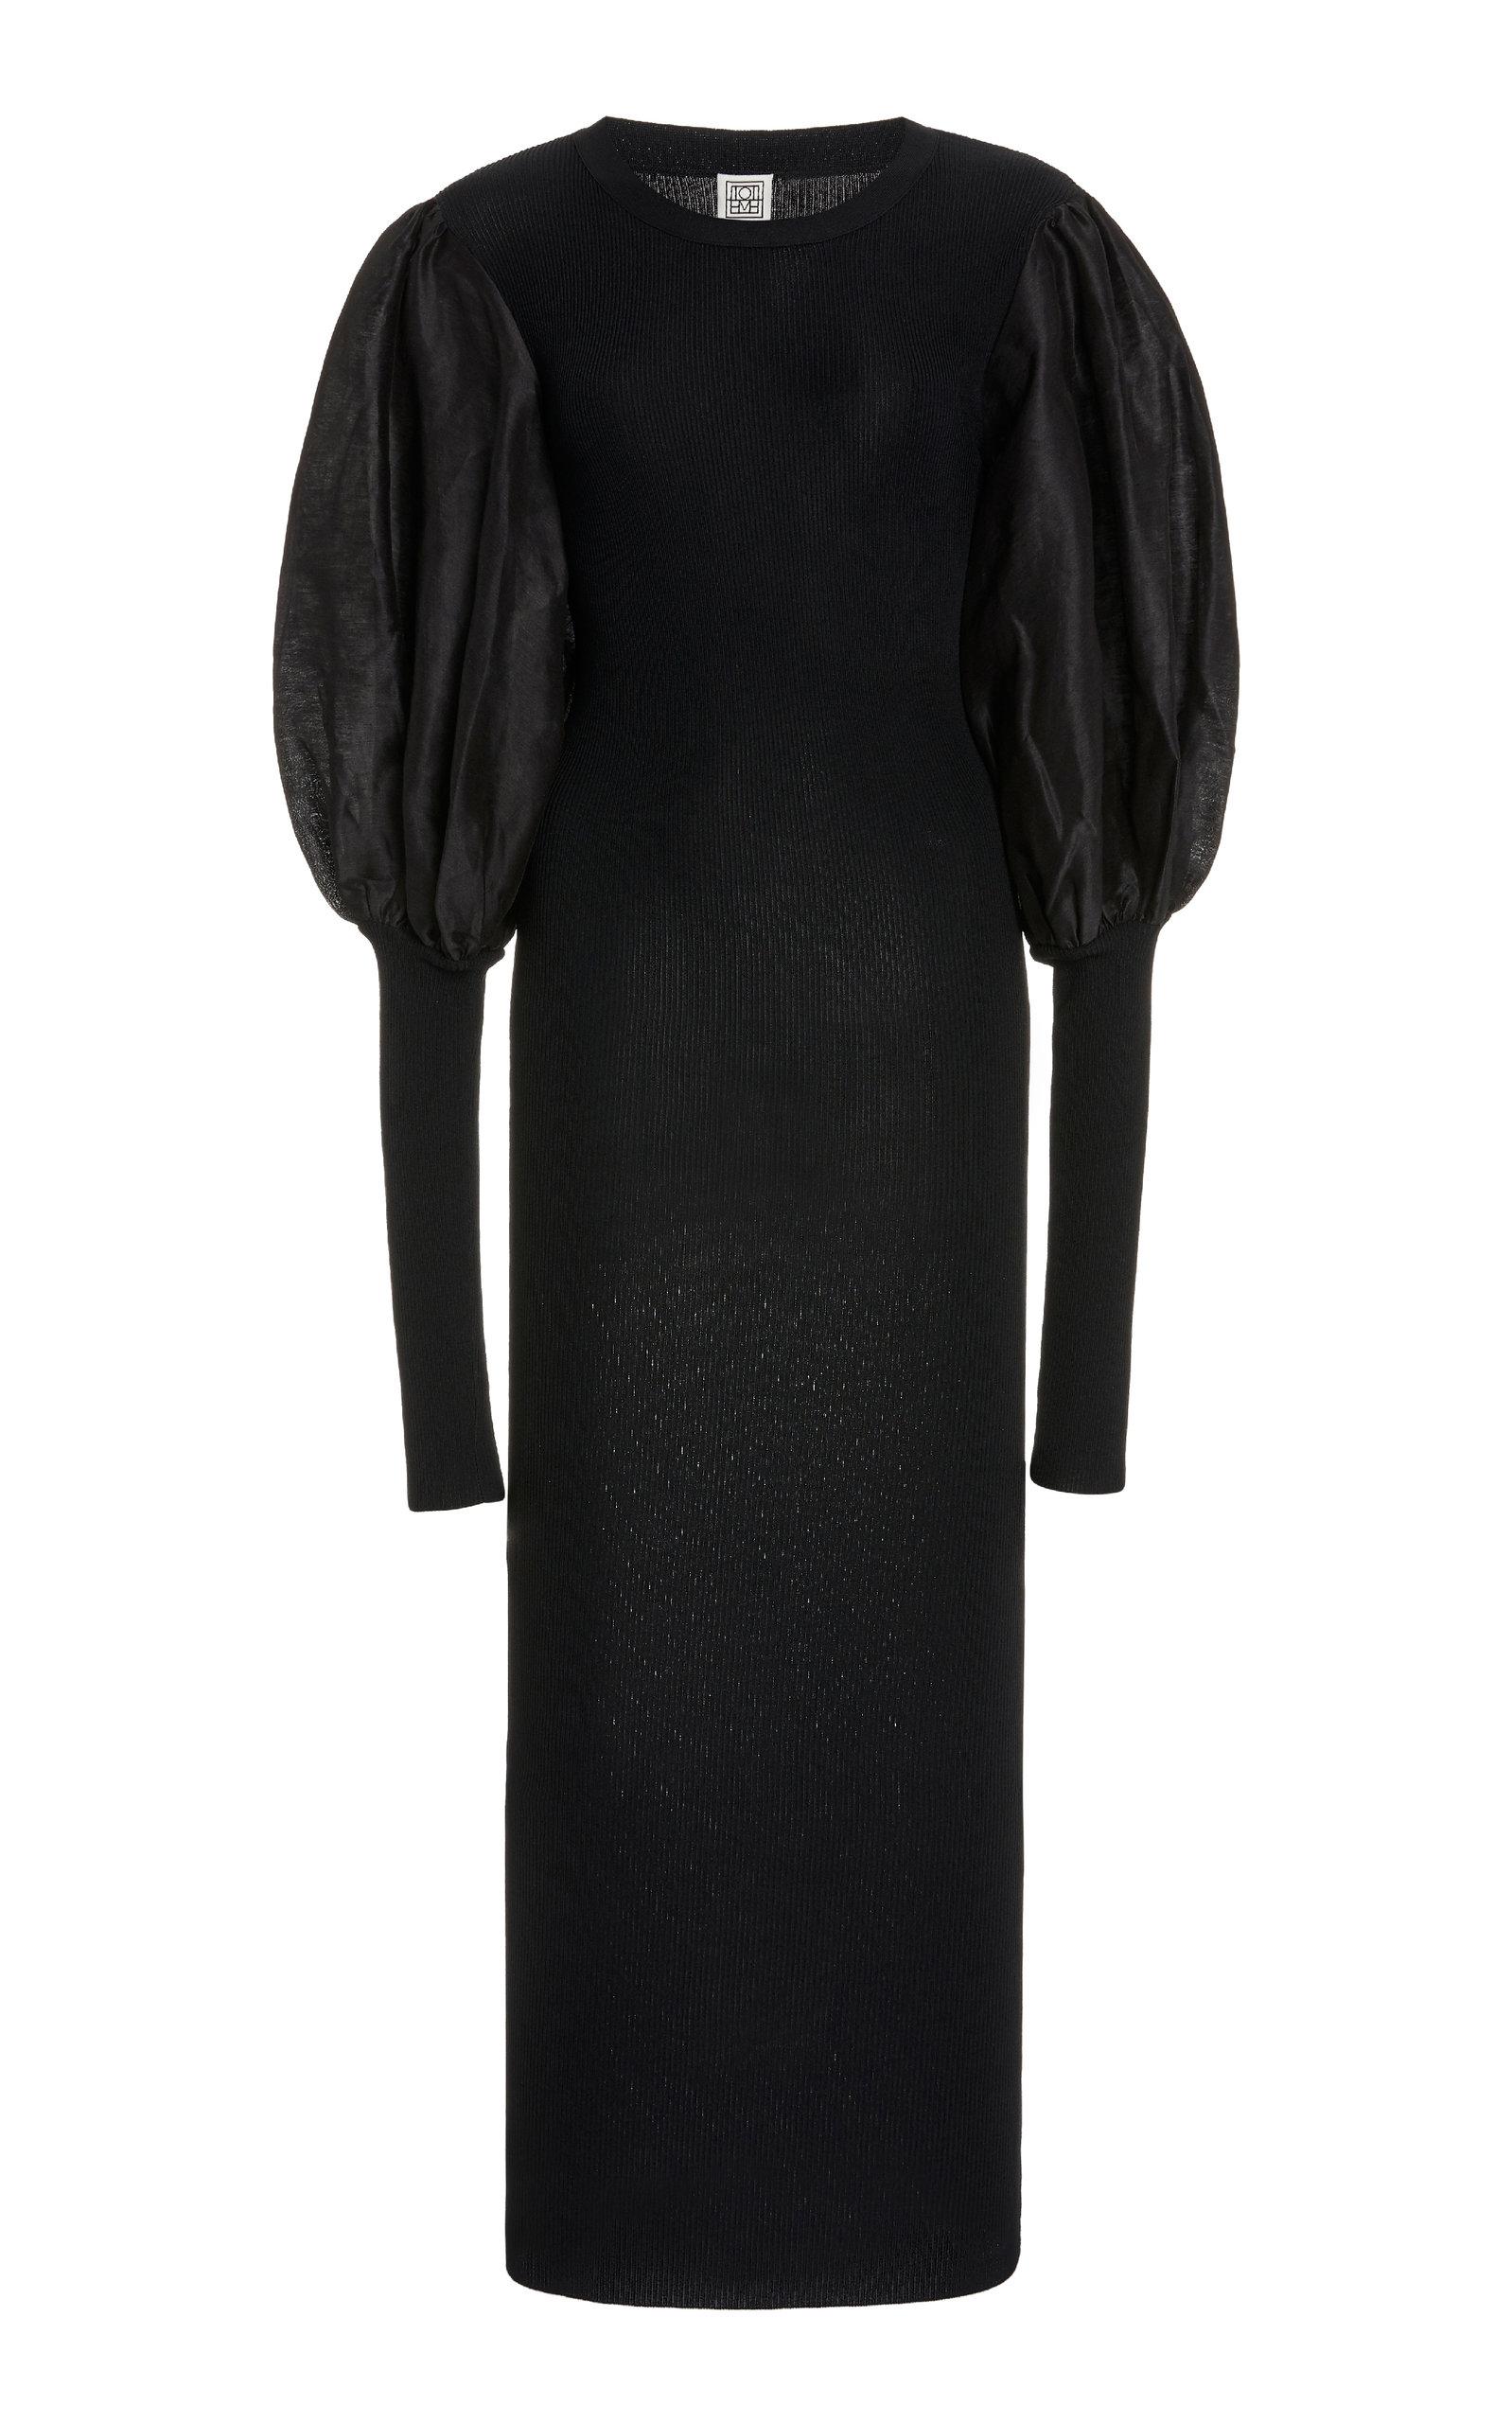 Buy Toteme Vignola Stretch-Knit Midi Dress online, shop Toteme at the best price